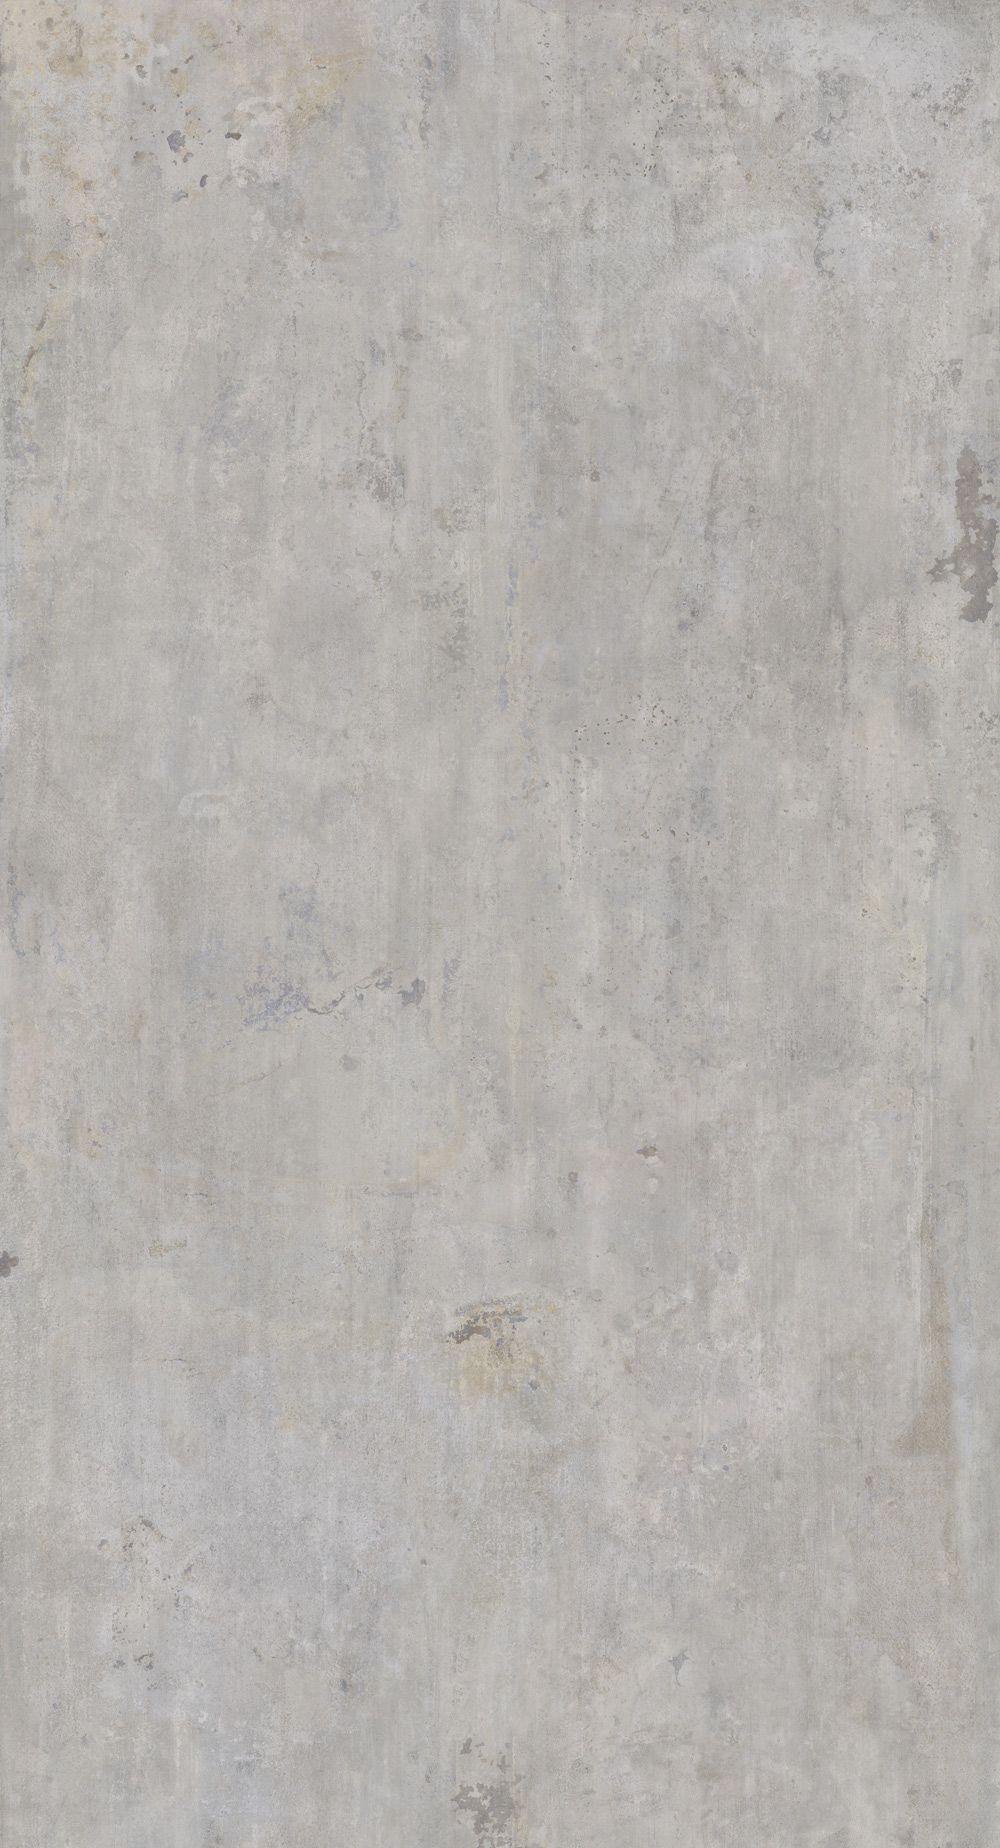 BETON_SILK-neolith-fusion-series-concrete | Tile Love | Pinterest ...